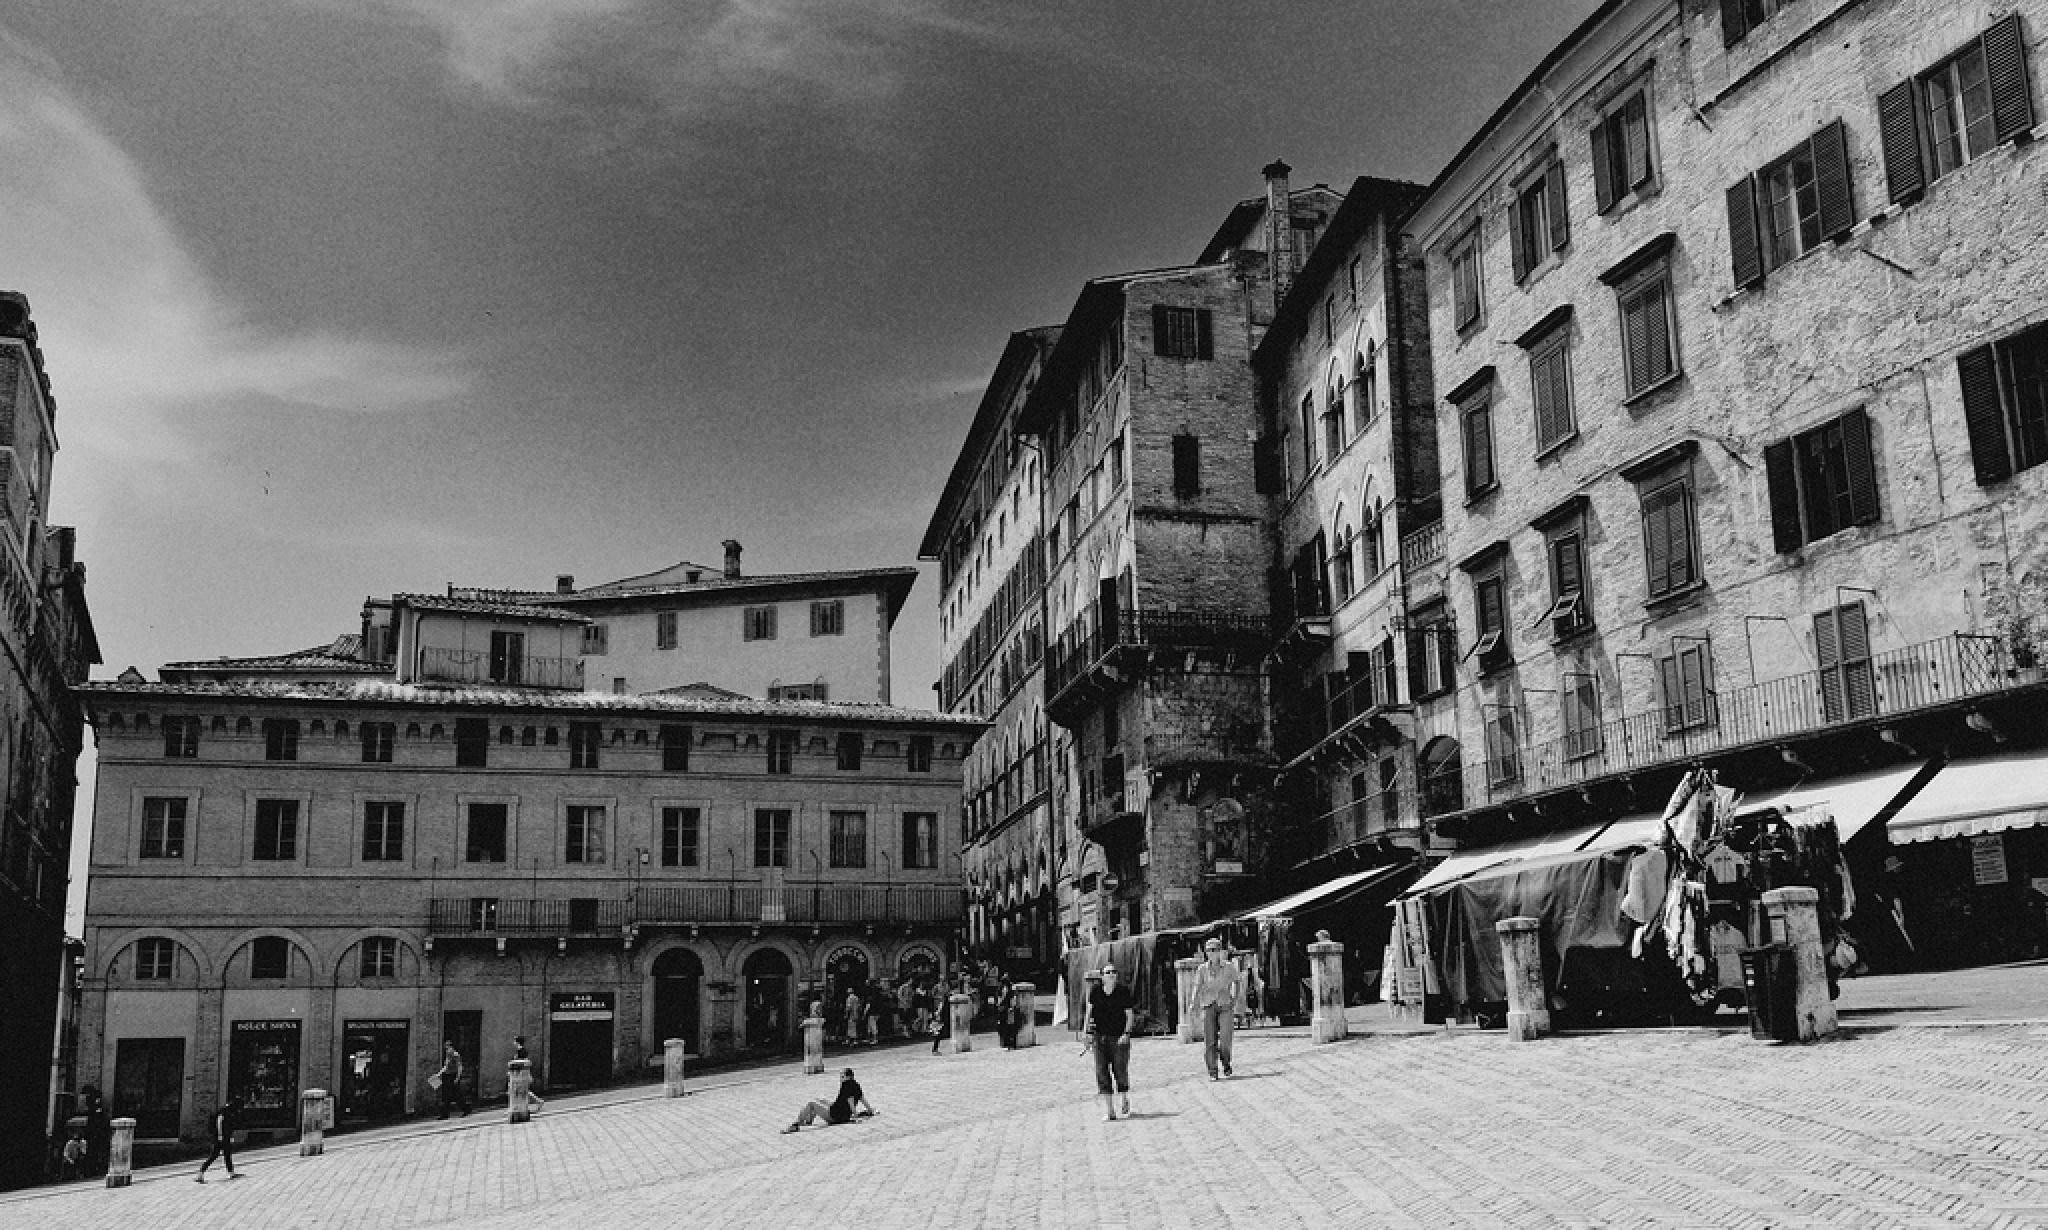 Siena - Centro Storico - Piazza del Campo by Wolfgang Dengler